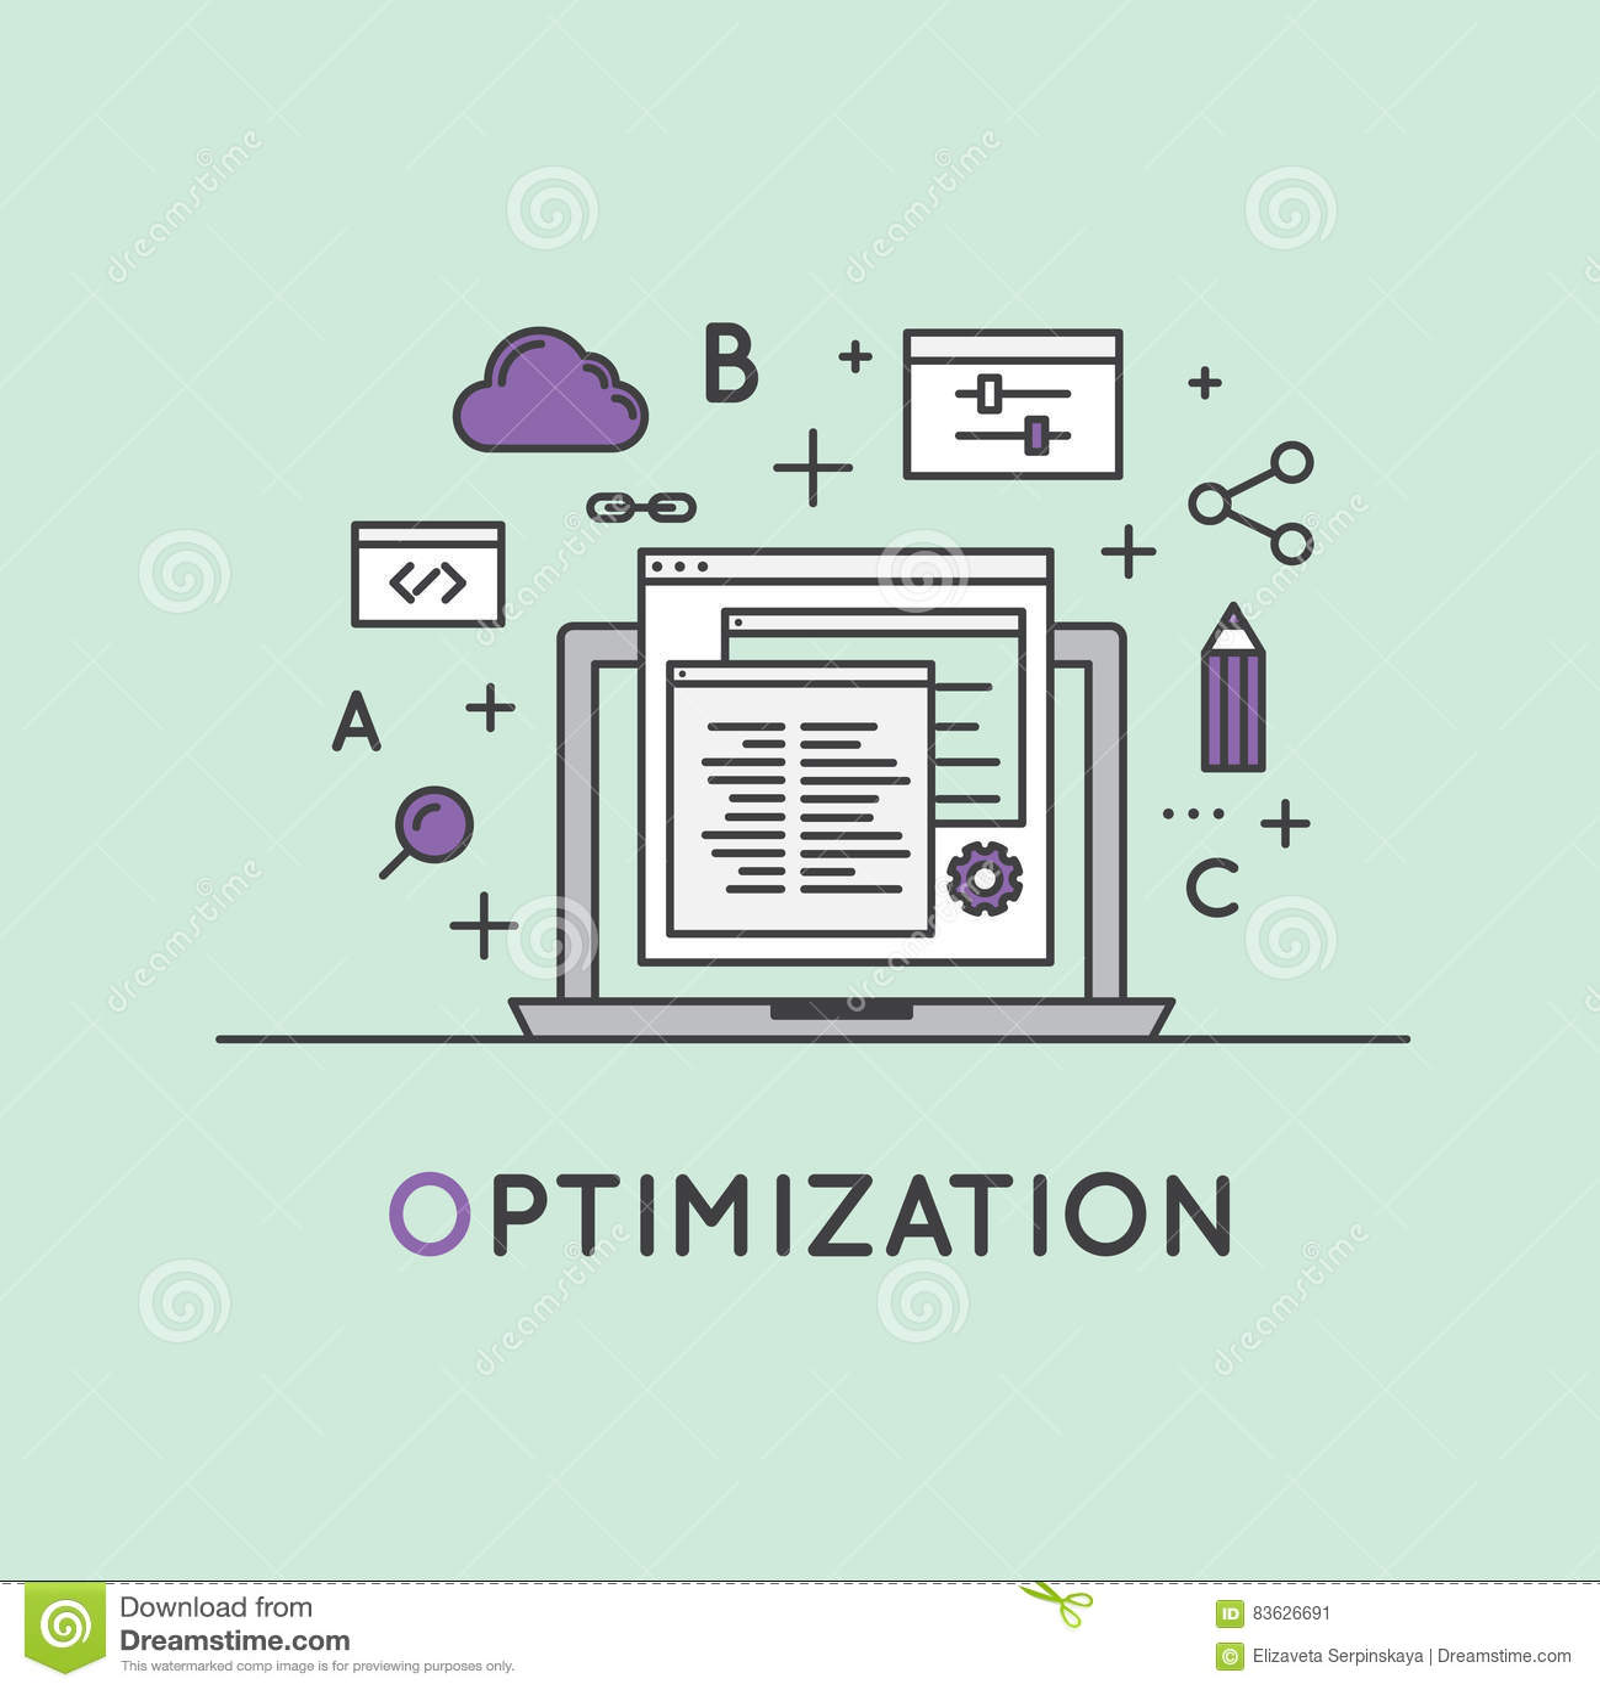 Illustration of SEO Search Engine Optimization Process